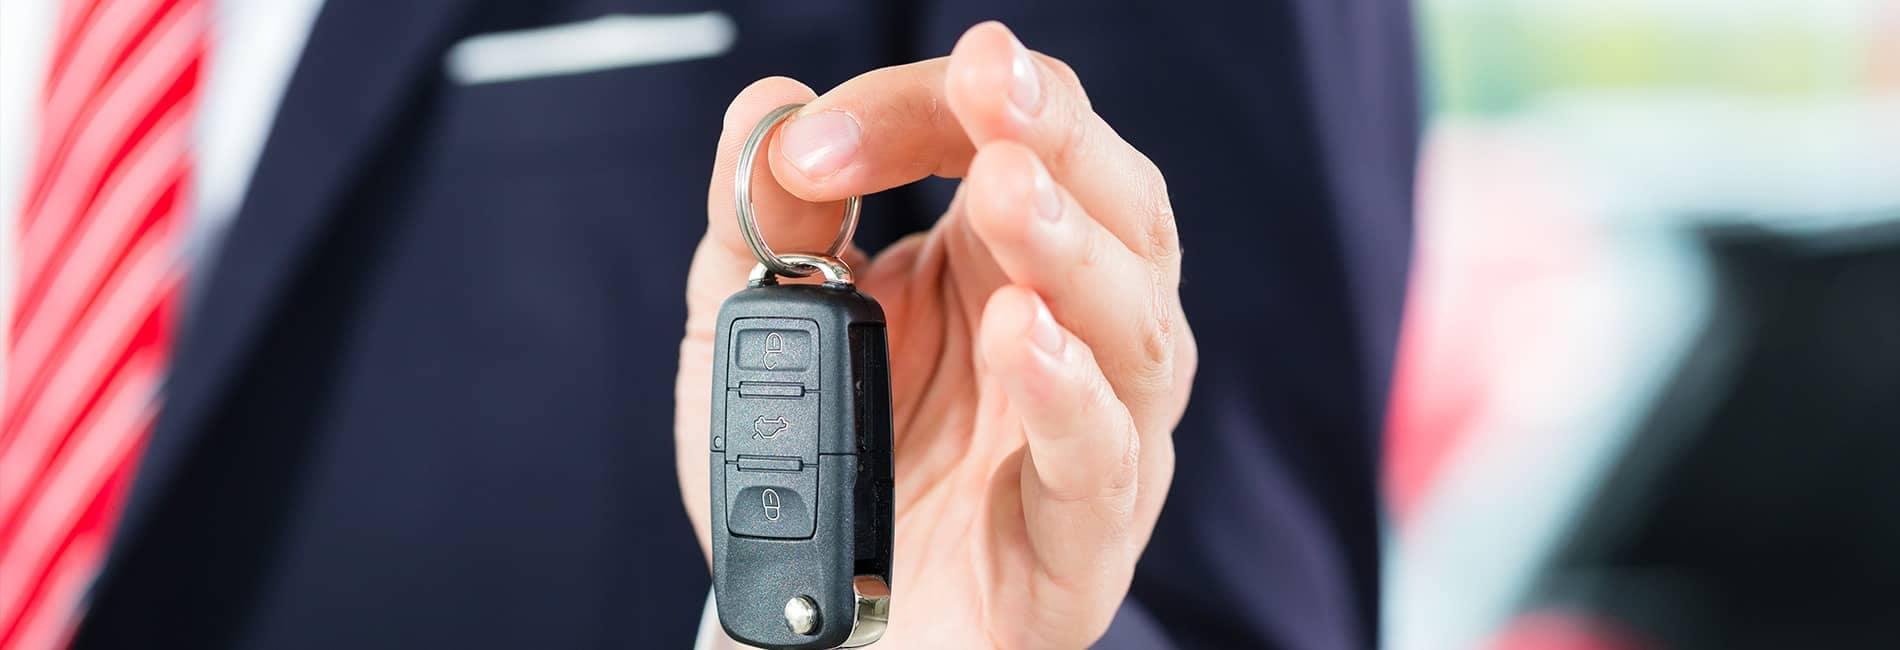 Car Key Fob being held